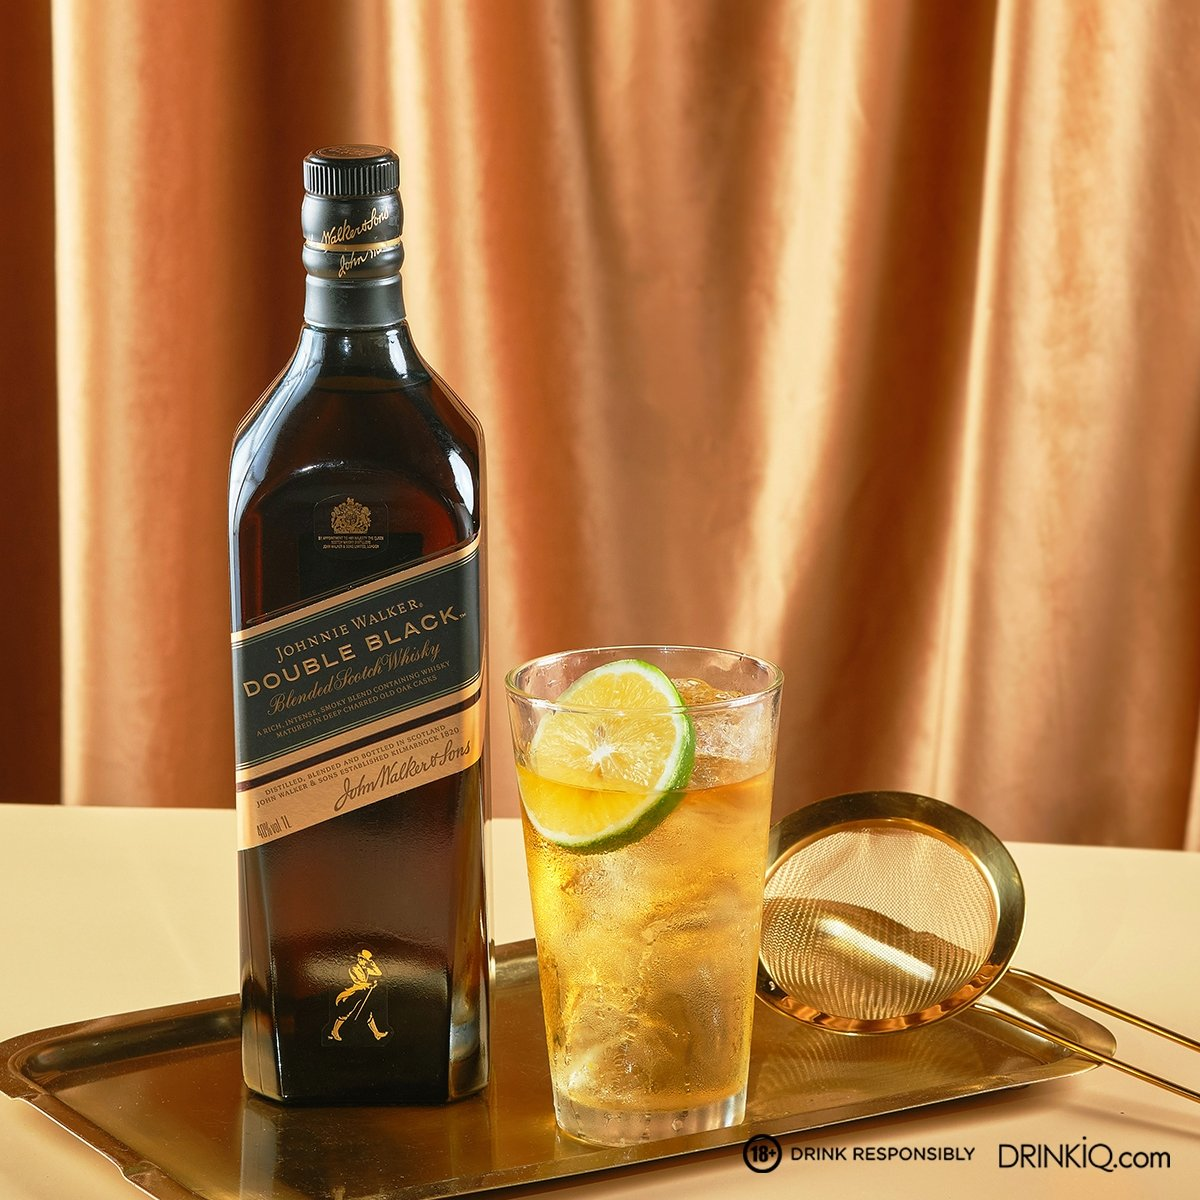 Botella de Double Back Whisky